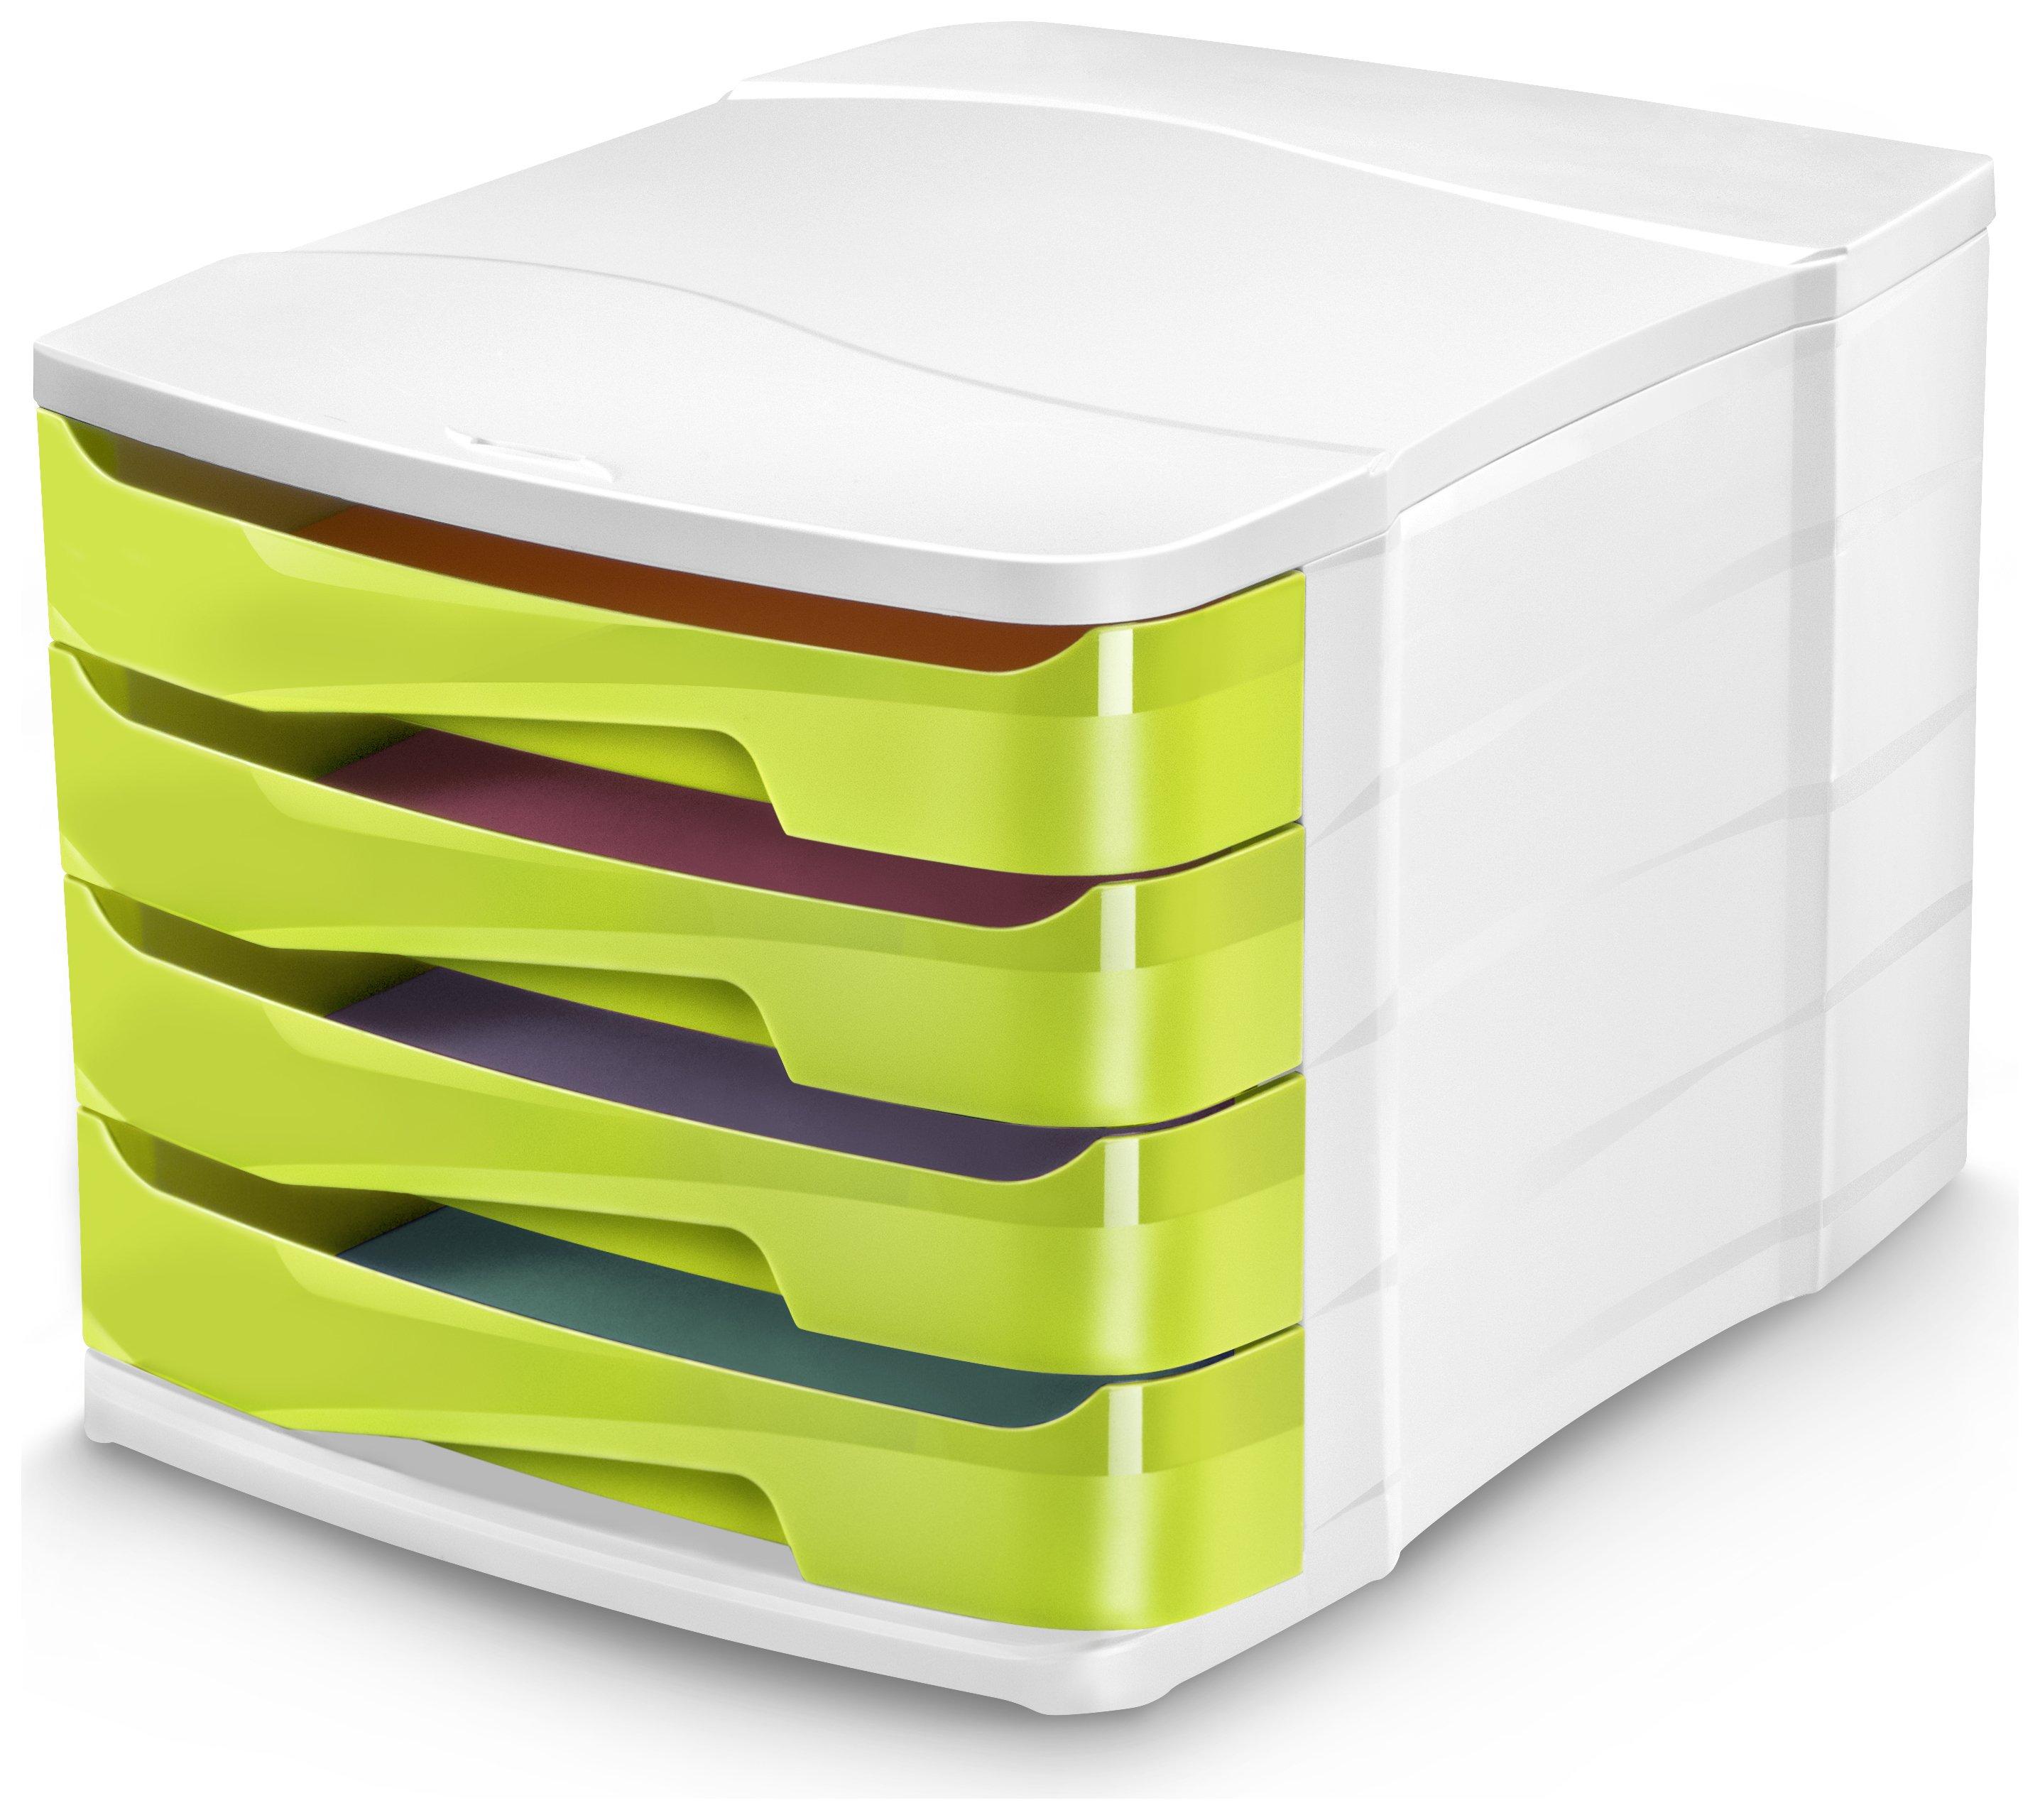 Image of CEP Green Desktop Storage - Set of 4